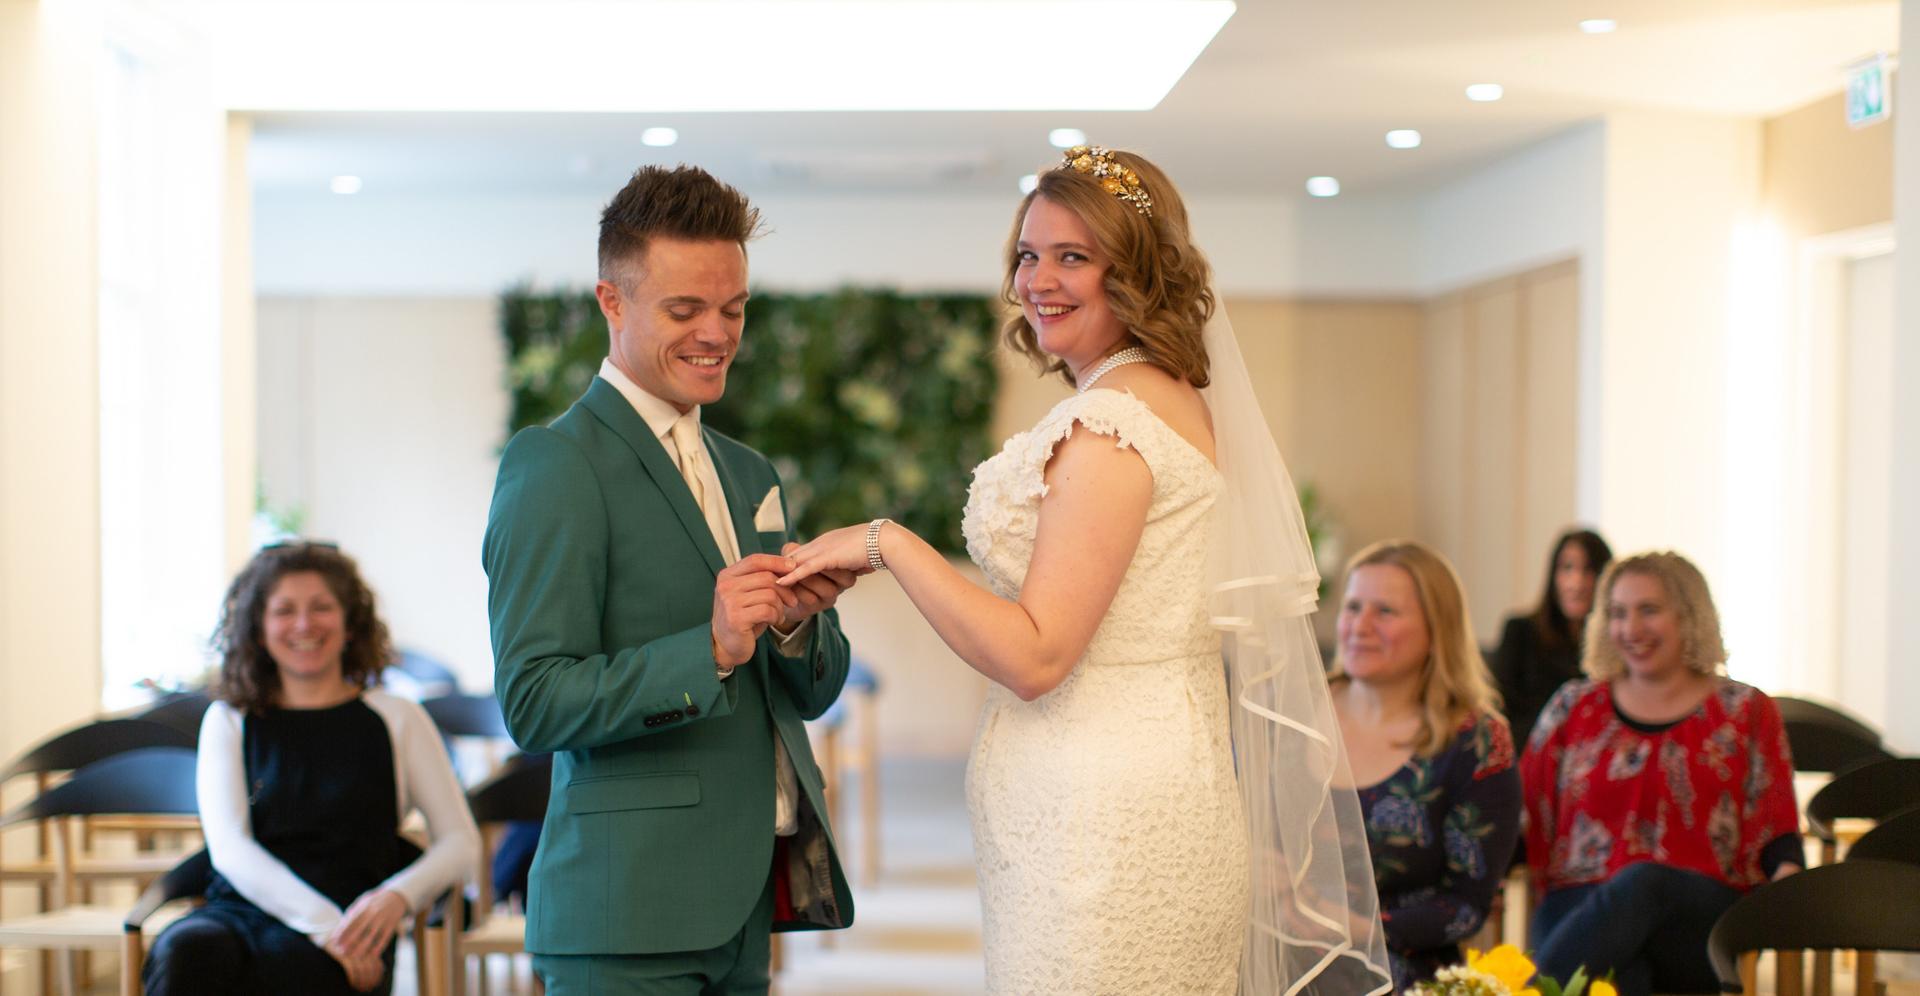 Ceremony Venues Image